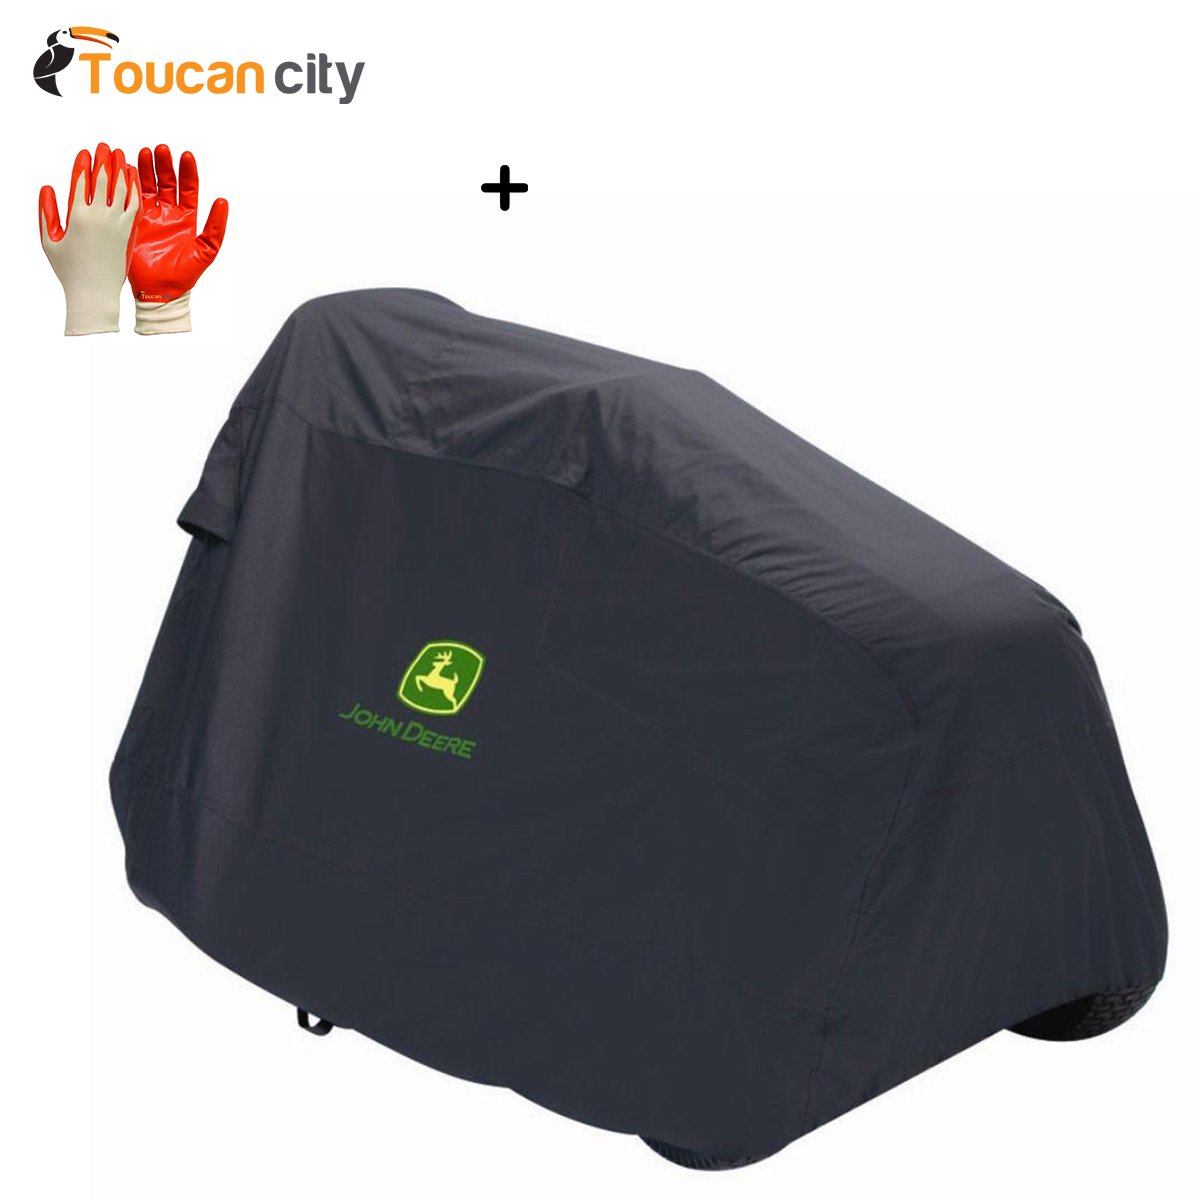 Toucan City Nitrile Dip Gloves (5-Pack) and John Deere Deluxe Riding Mower Cover 93617-3PK